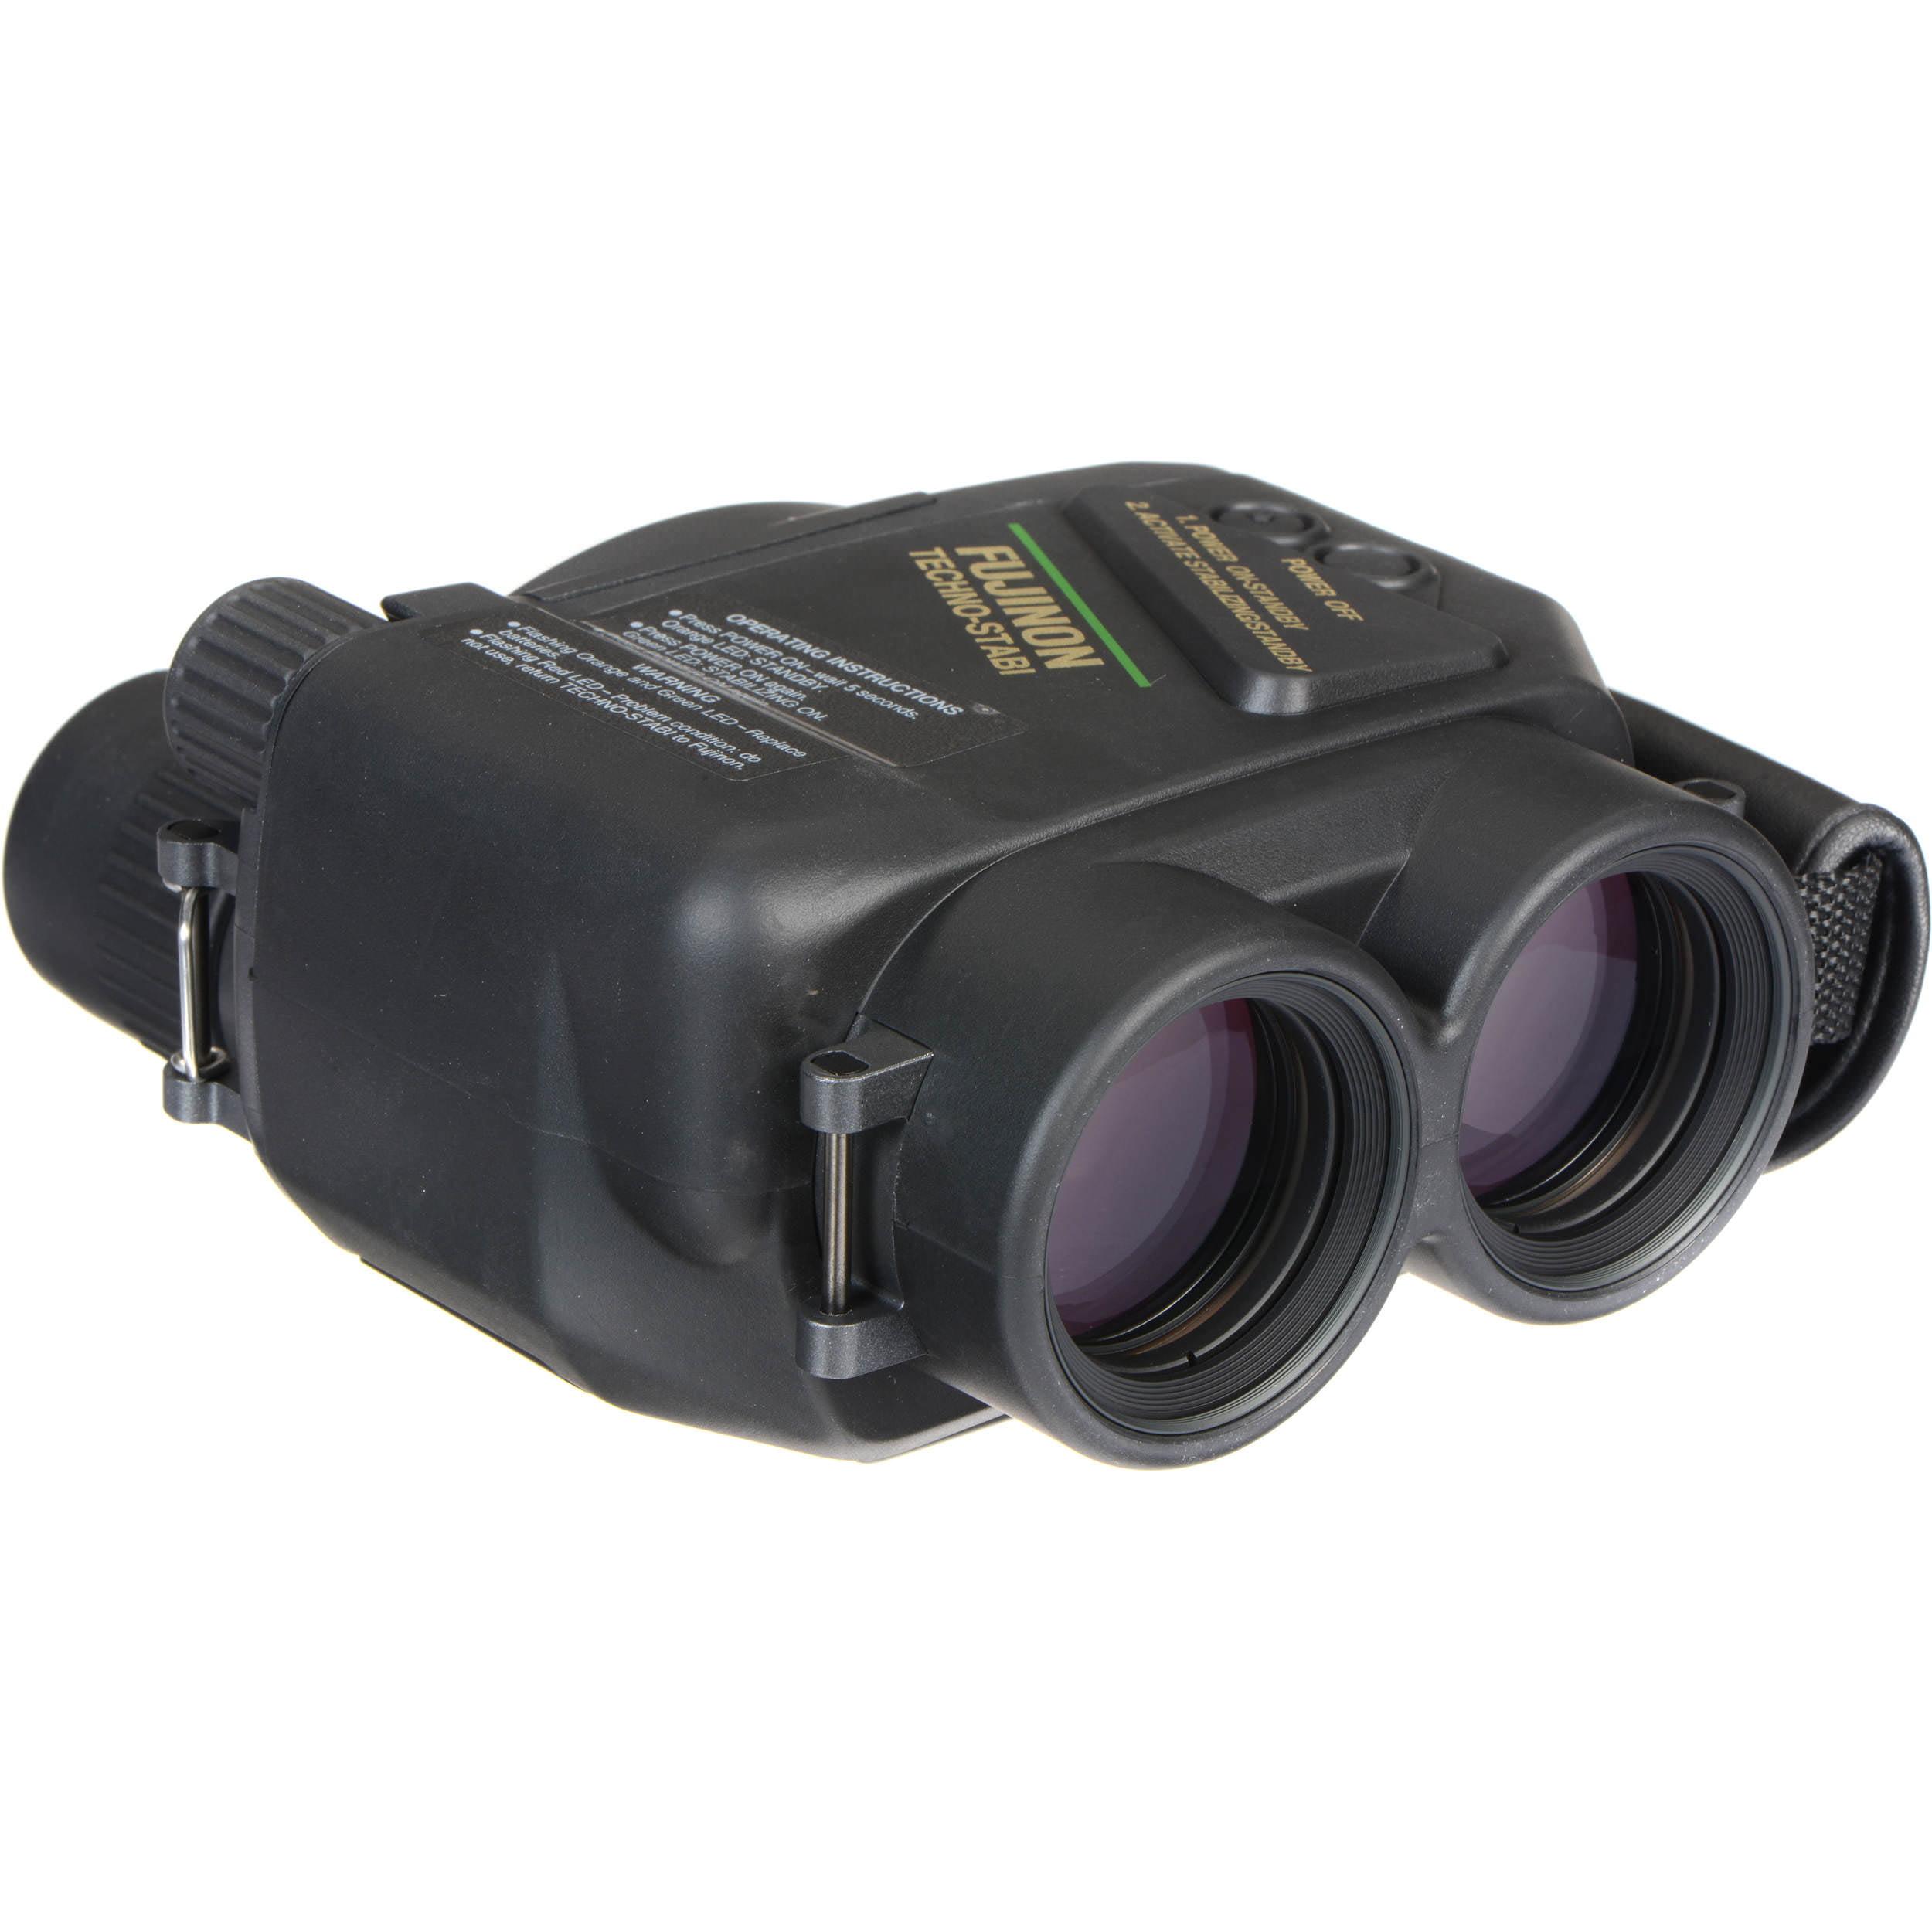 Fujinon 14x40 TS1440 Techno-Stabi IMage Stabilized Binocular by Fuji